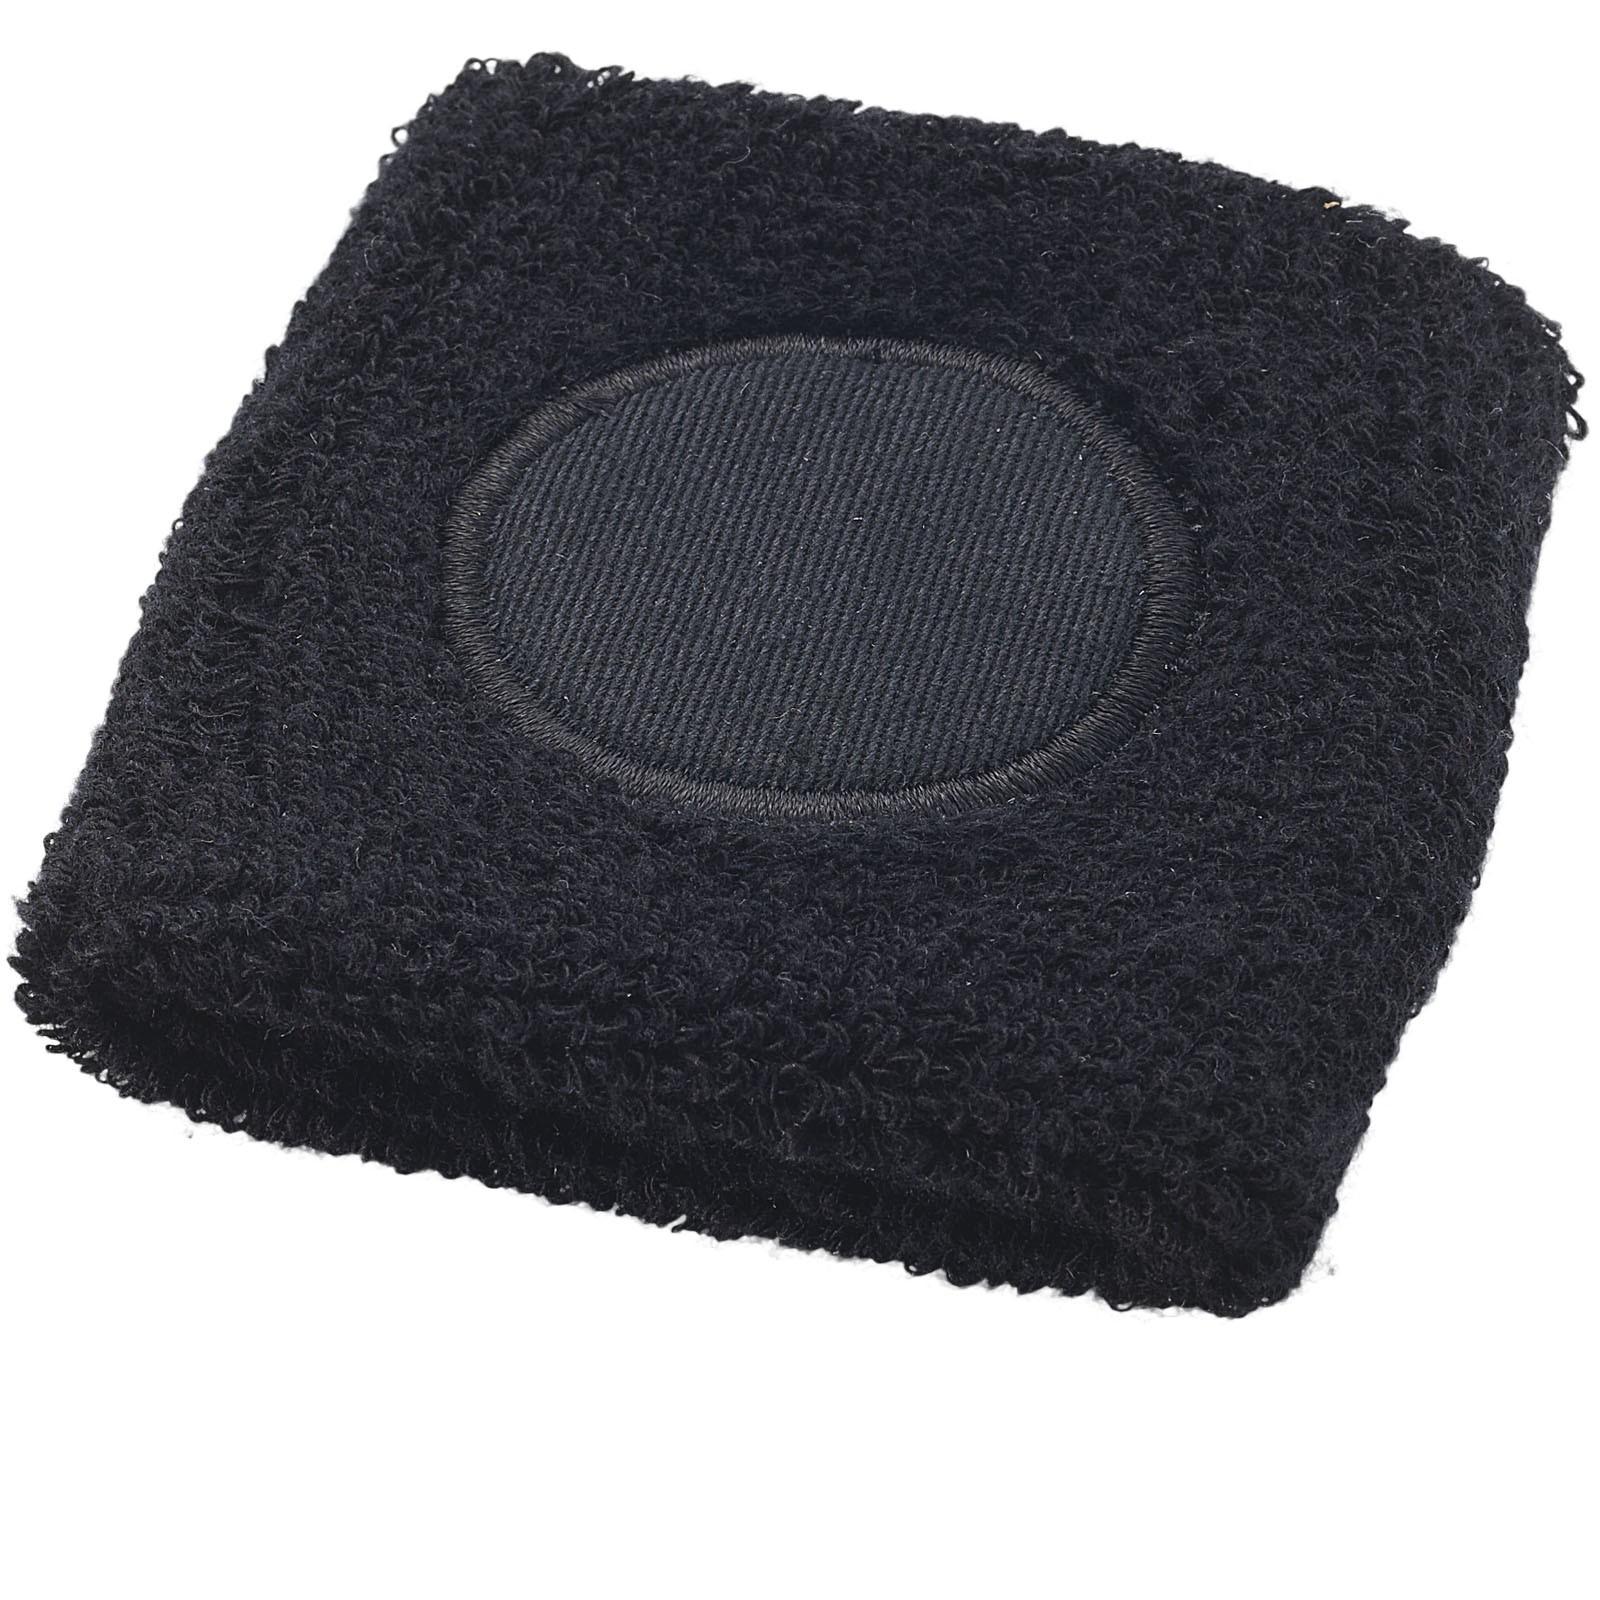 Hyper performance wristband - Solid black